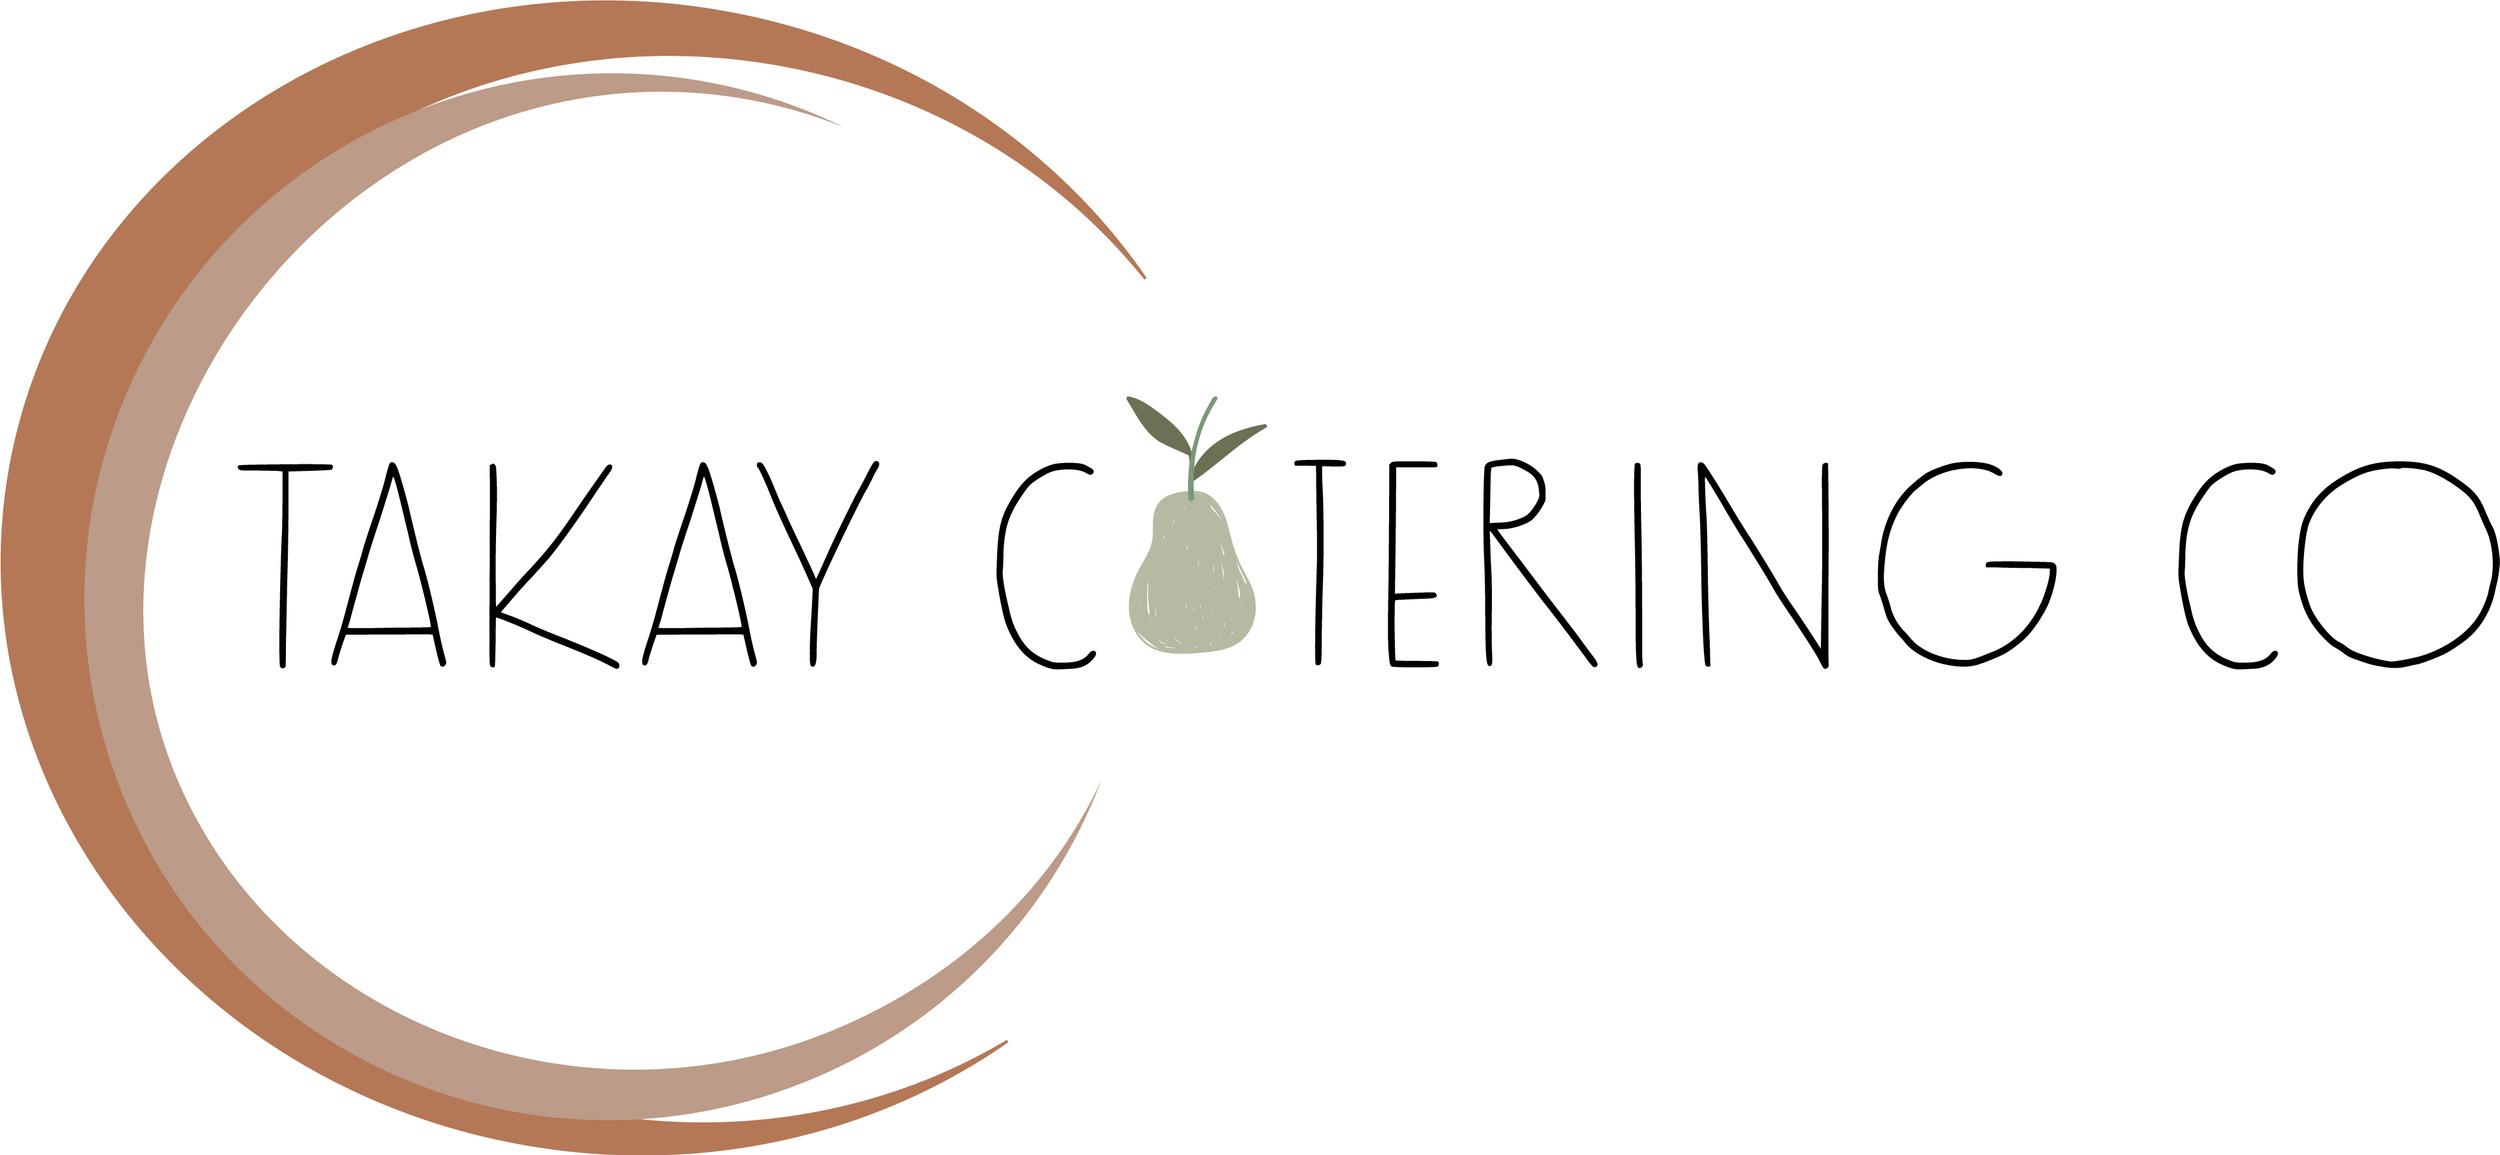 Cotering